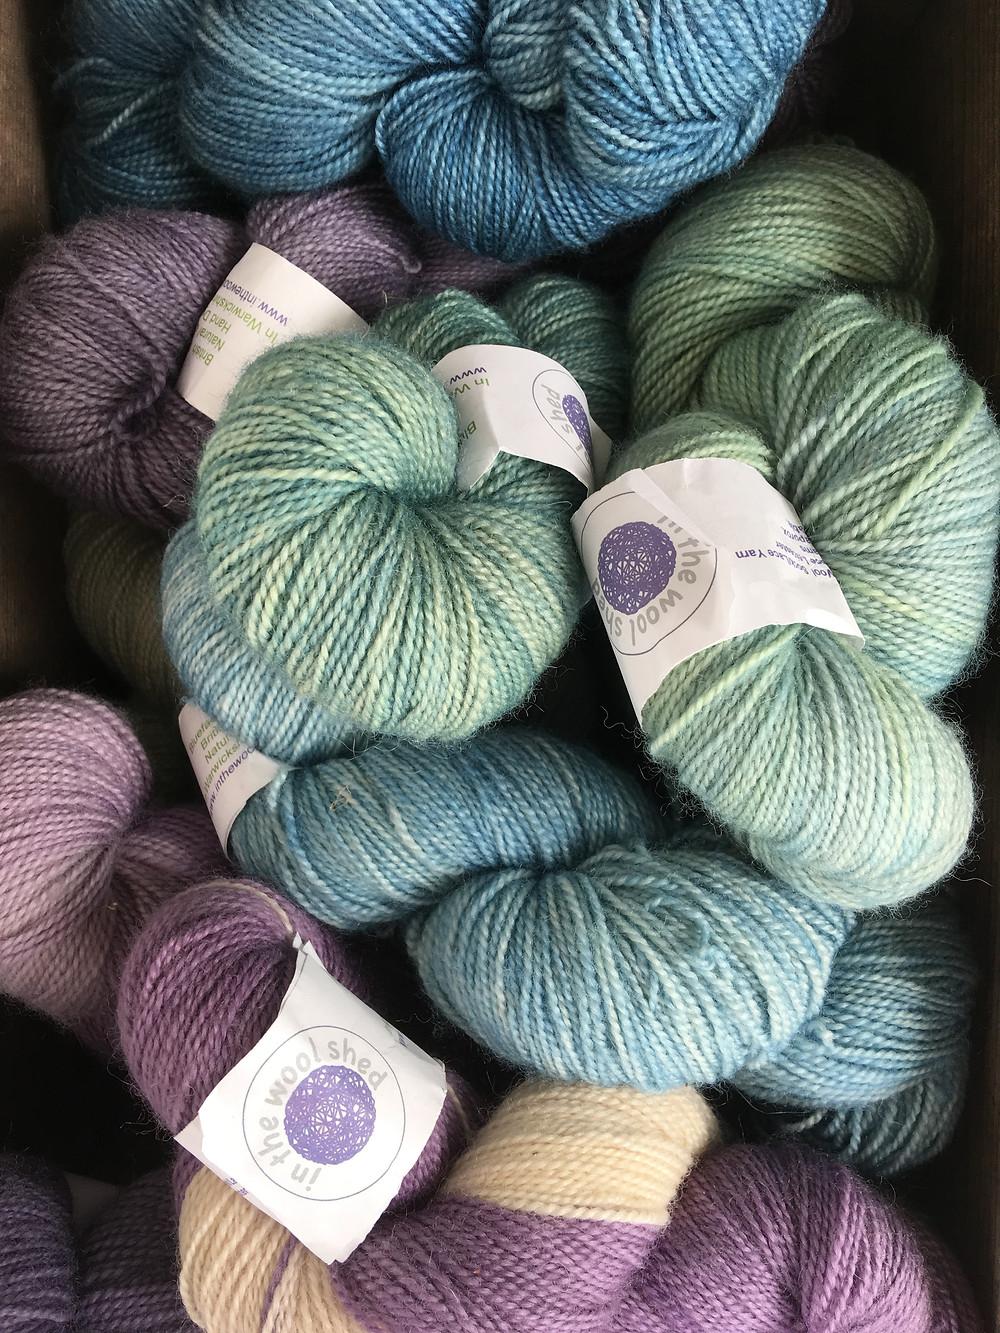 BFL sock yarn now available at Wool Warehouse Leamington Spa